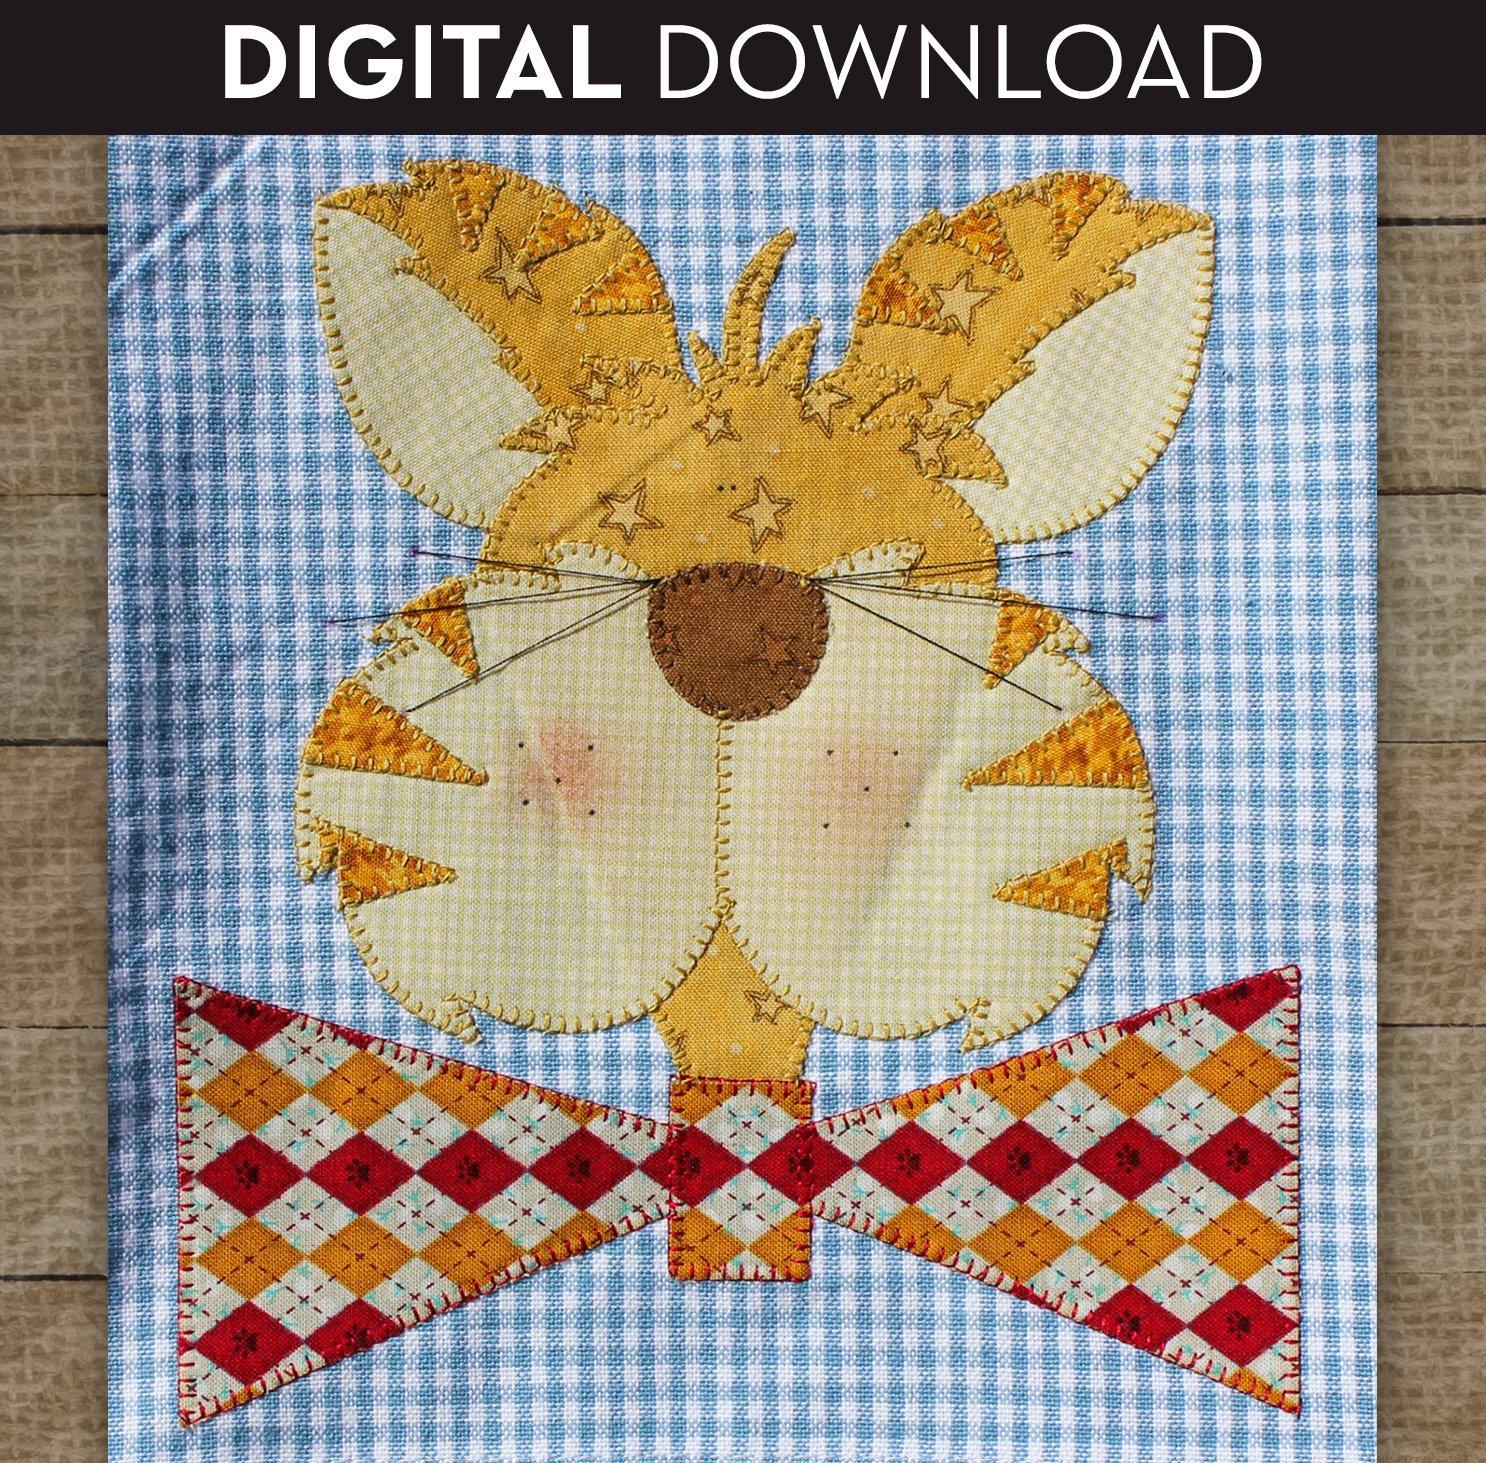 Tiger Cat - Download